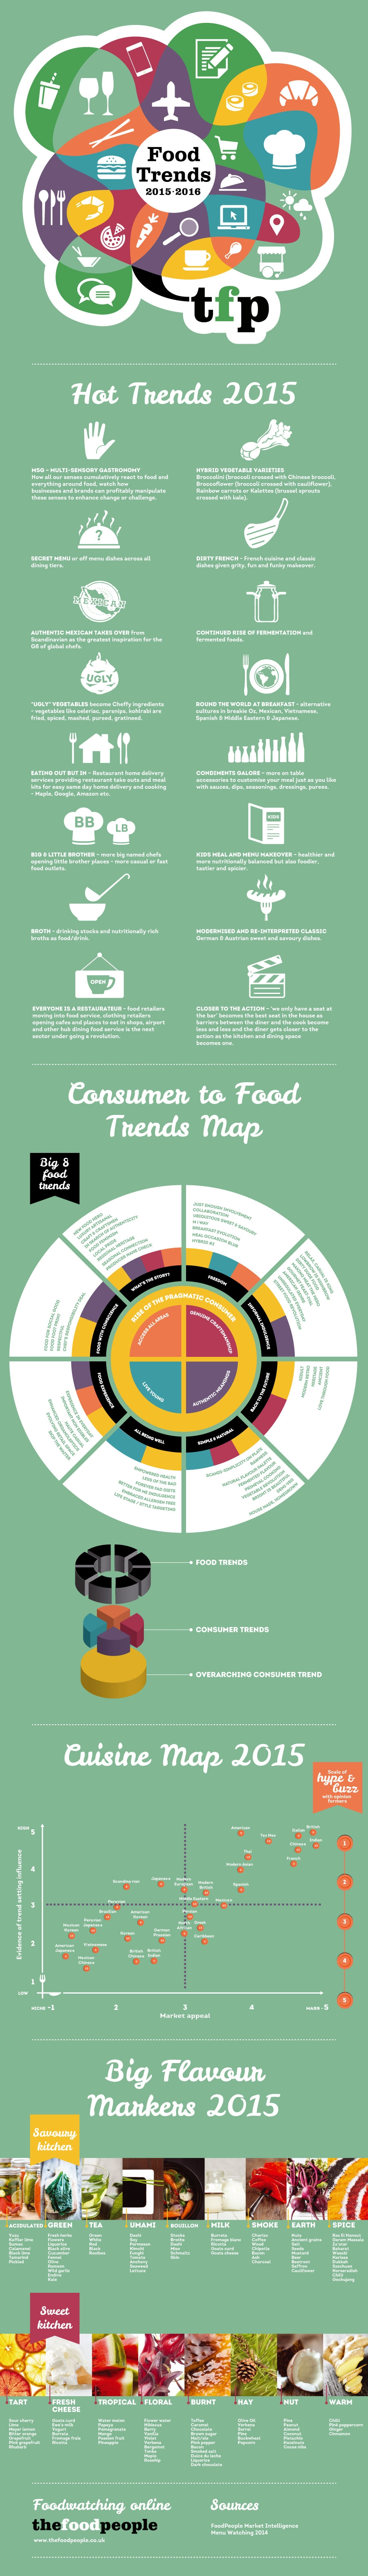 2015_food_trends_infographic.jpg